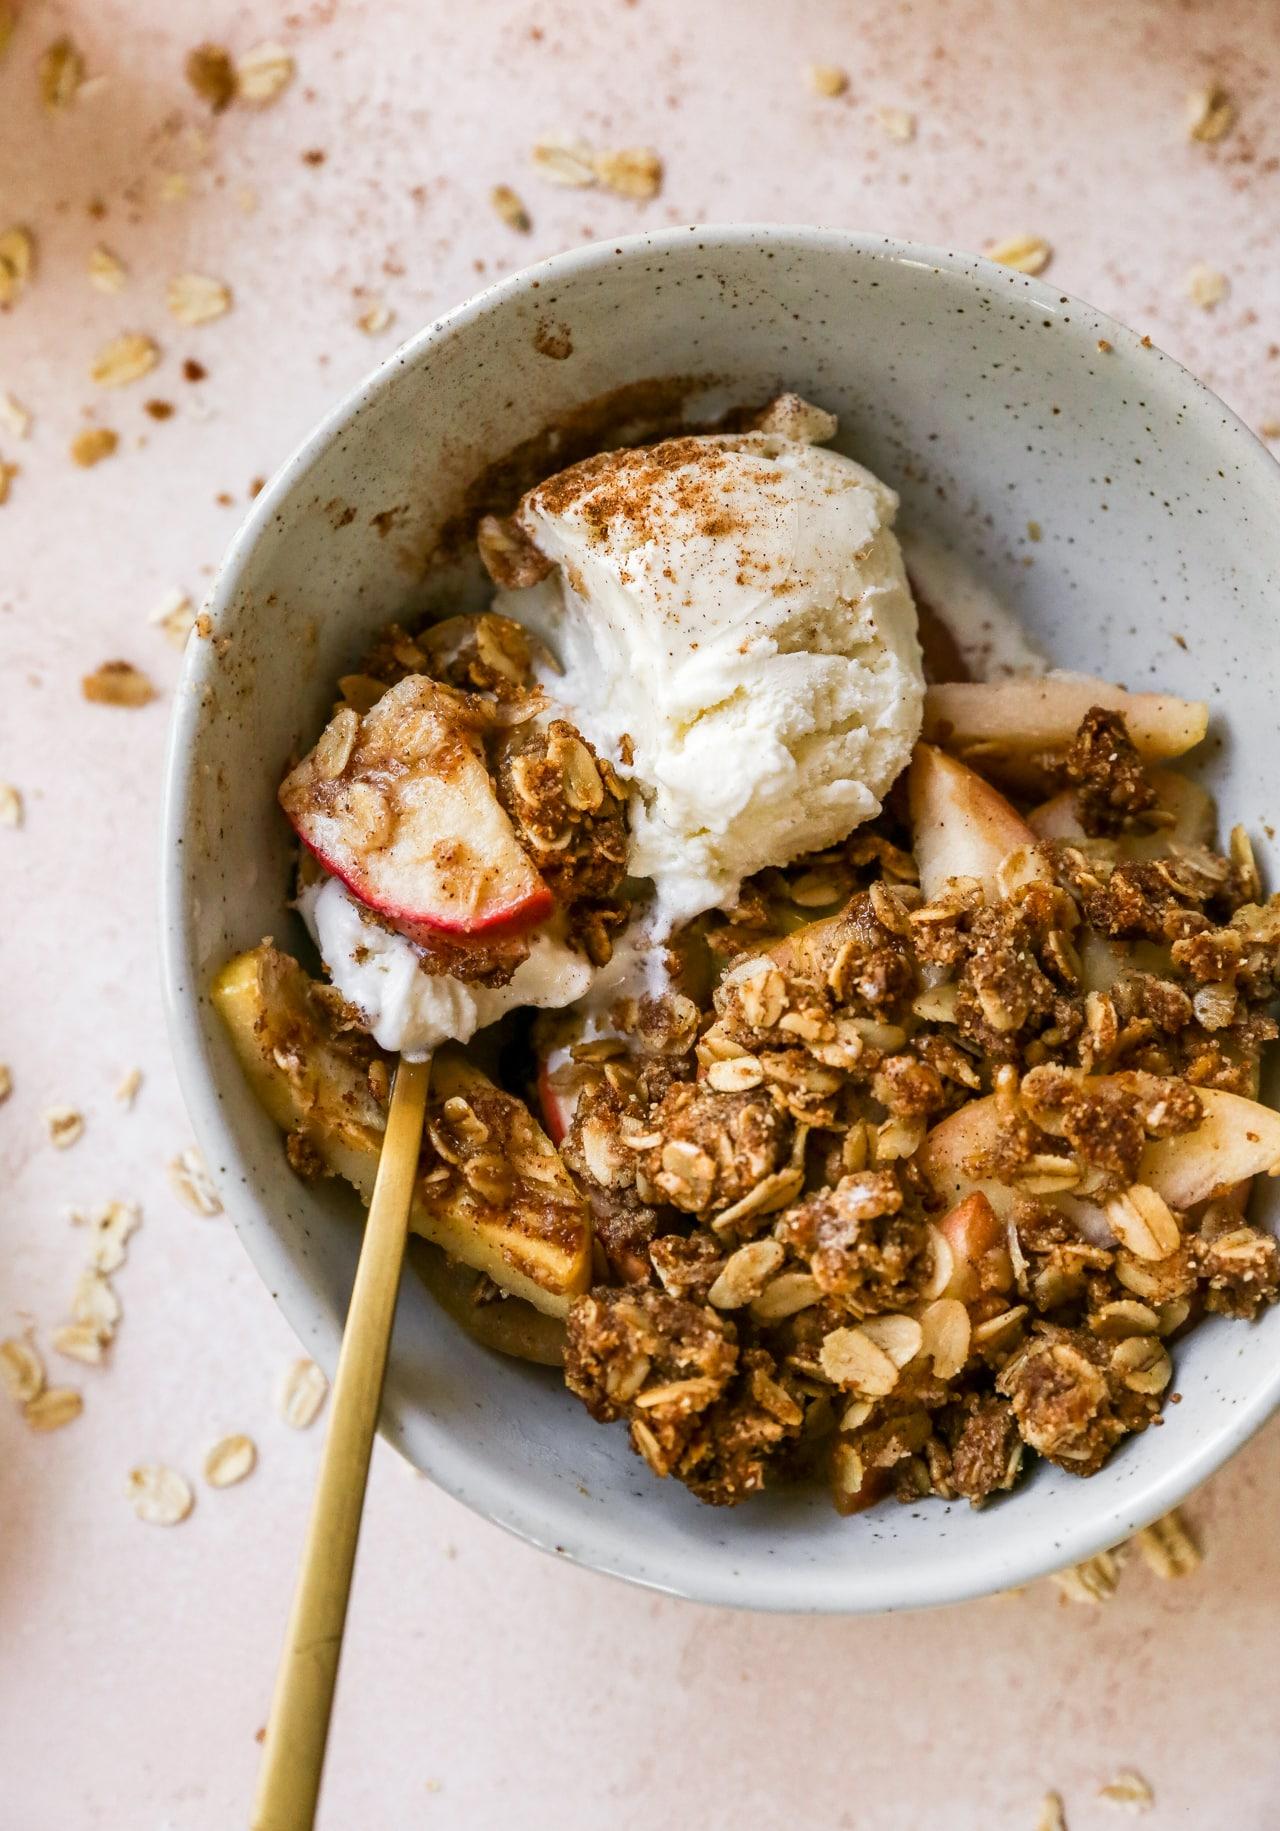 Healthy Apple Crisp Recipe Gluten Free Very Easy Kim S Cravings